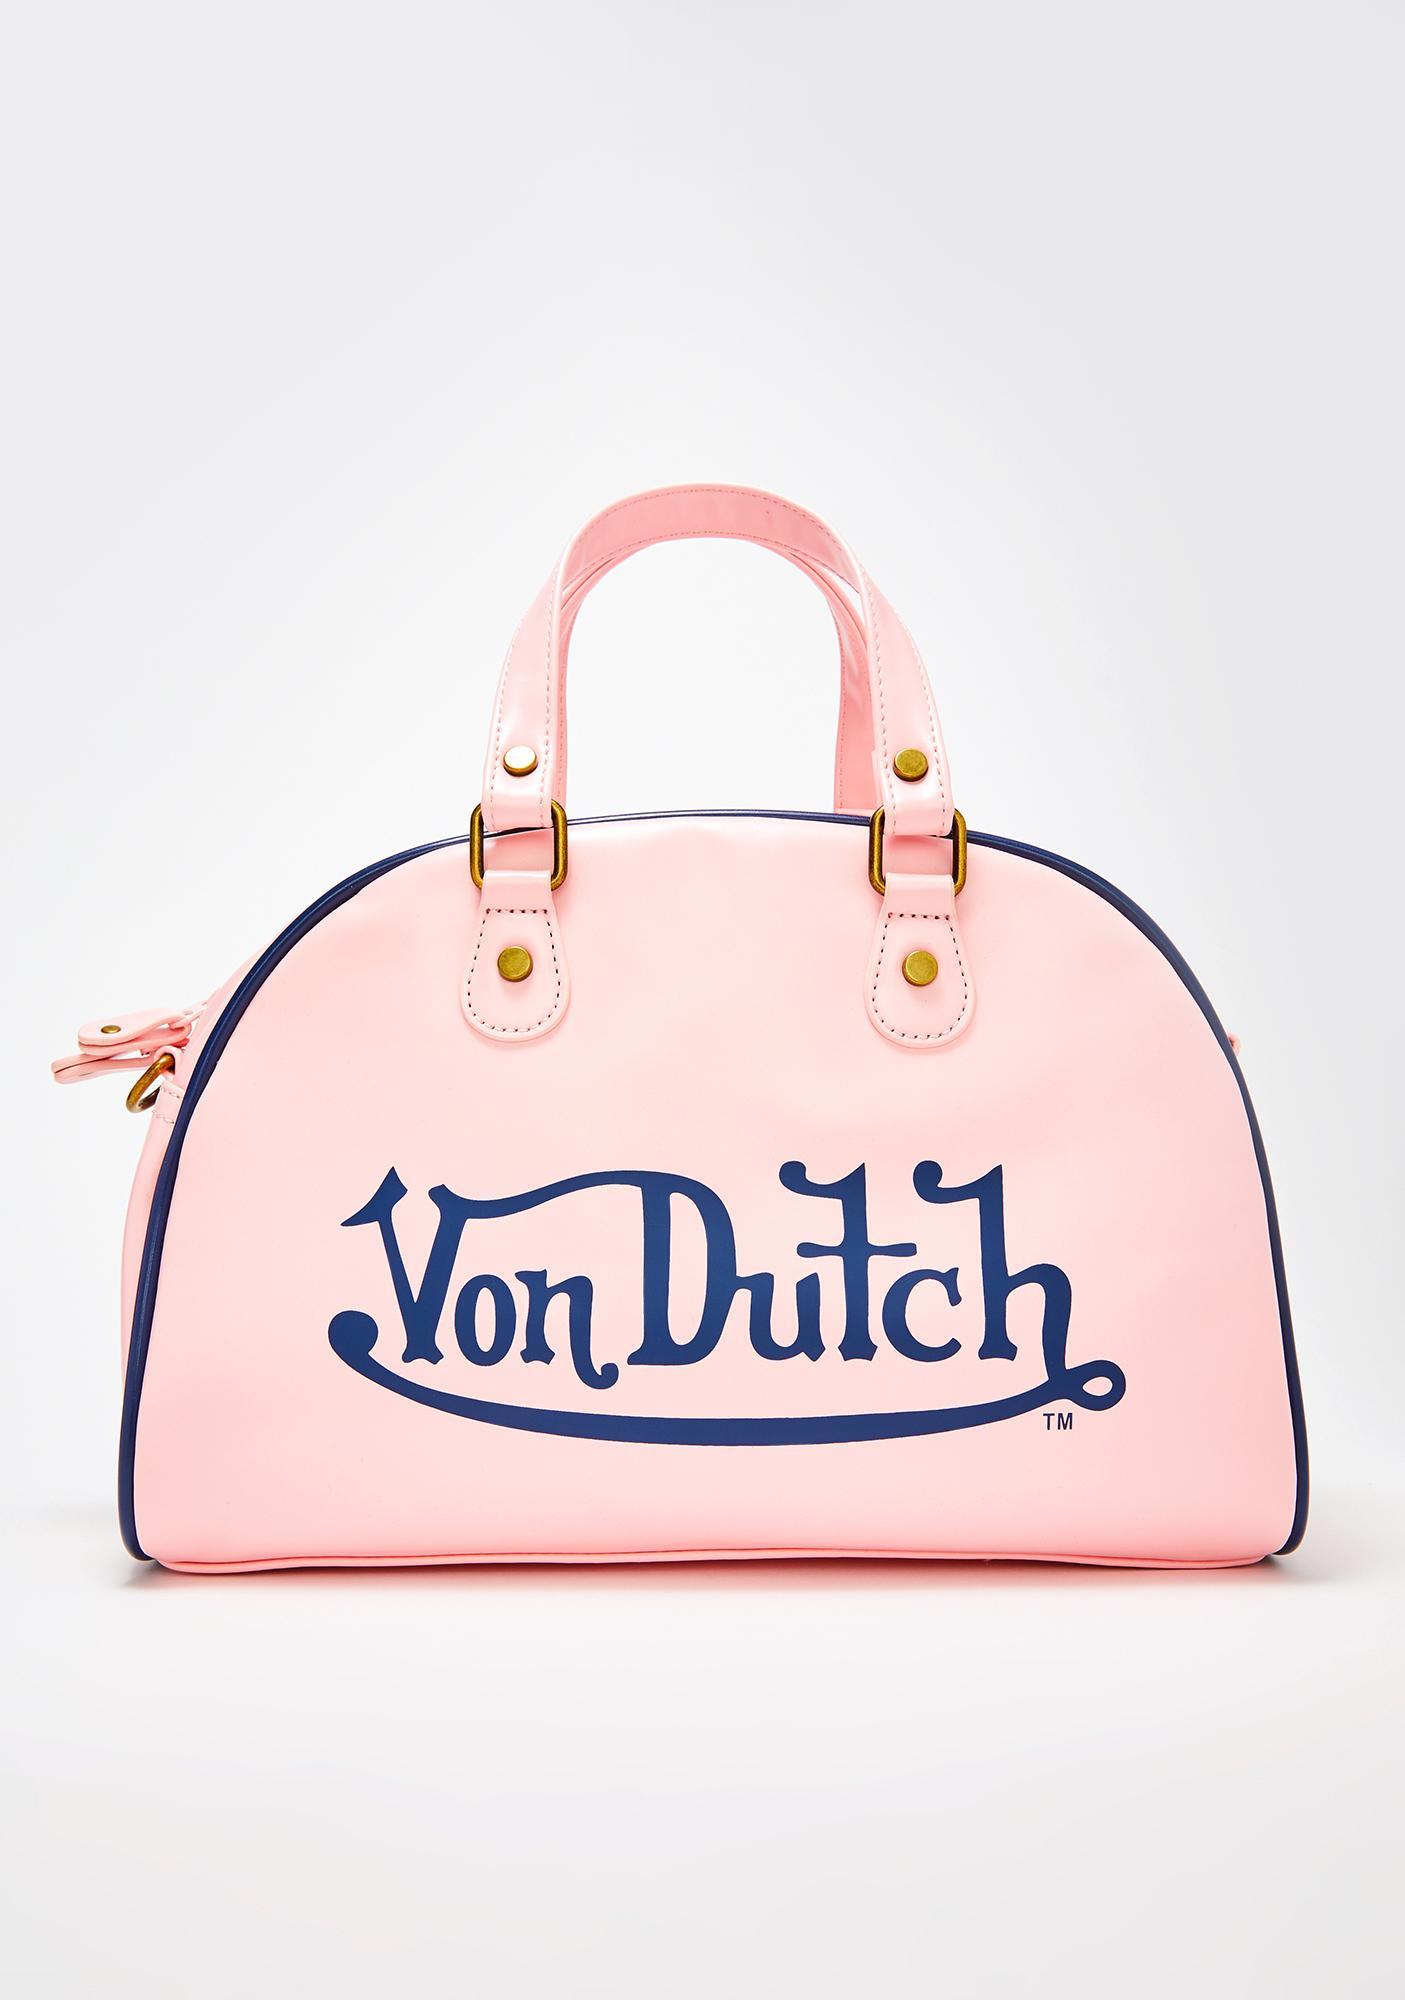 Von Dutch Medium Bowling Bag